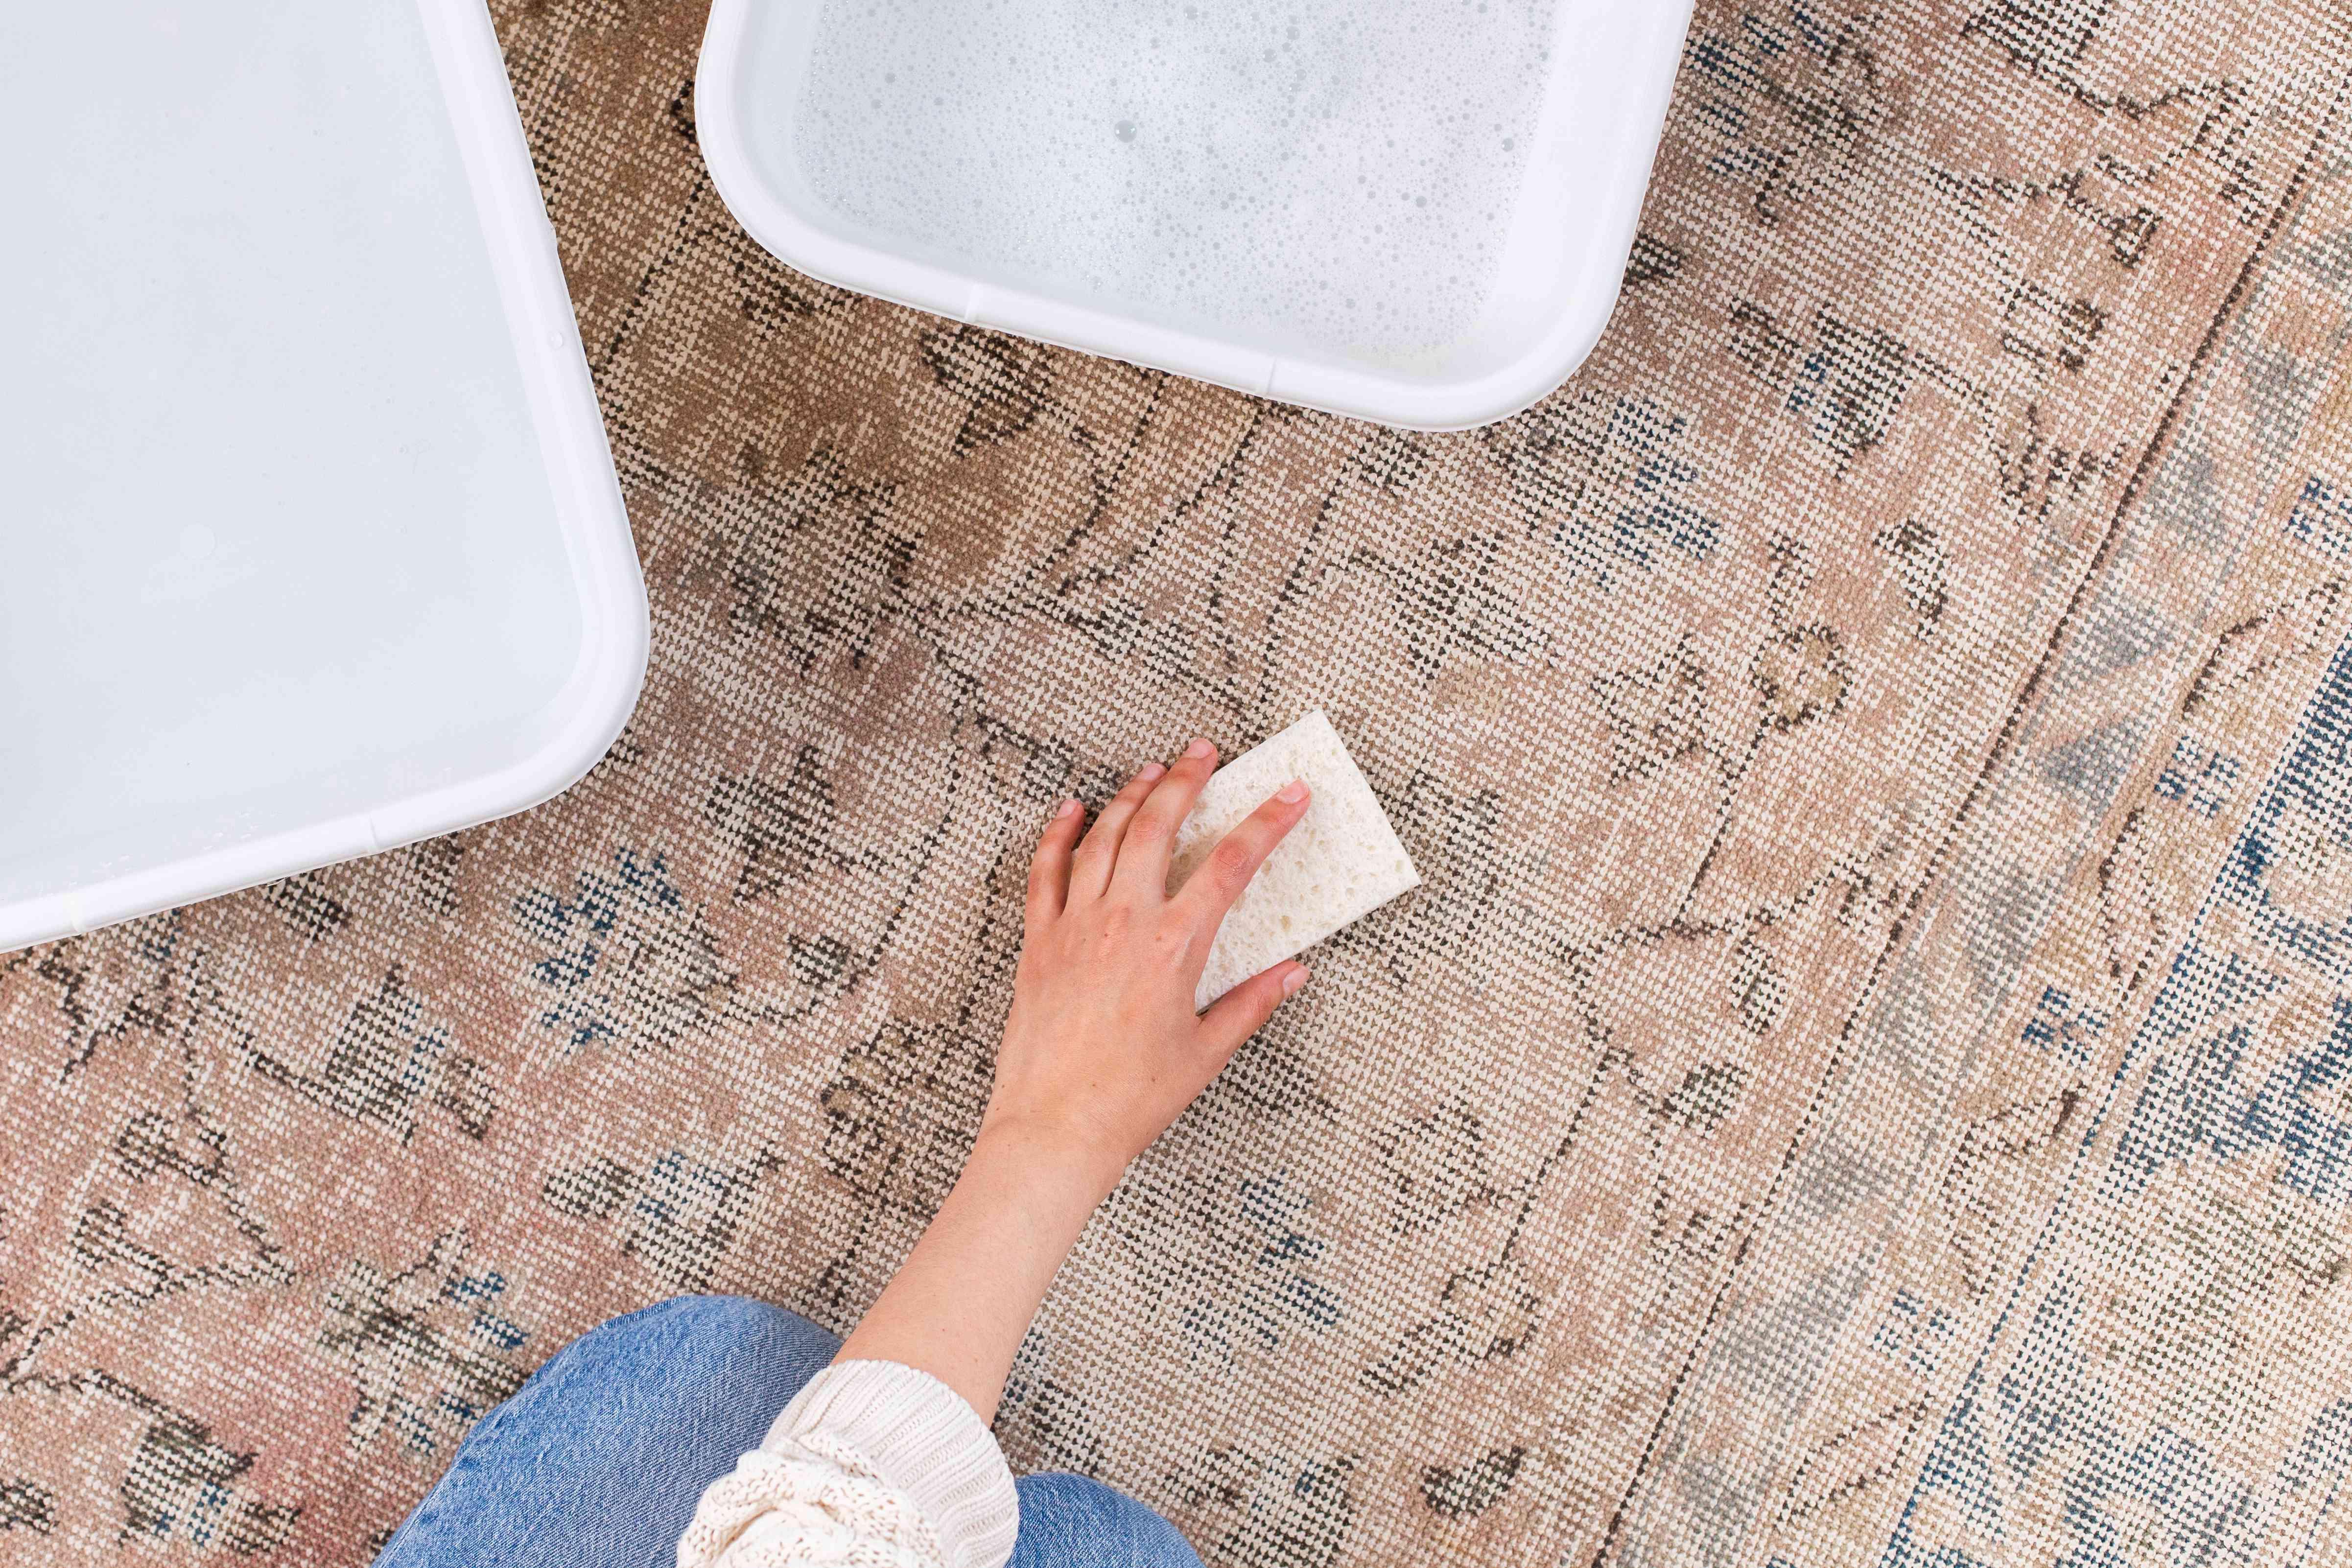 Sponge lightly scrubbing wool rug with wool wash detergent solution